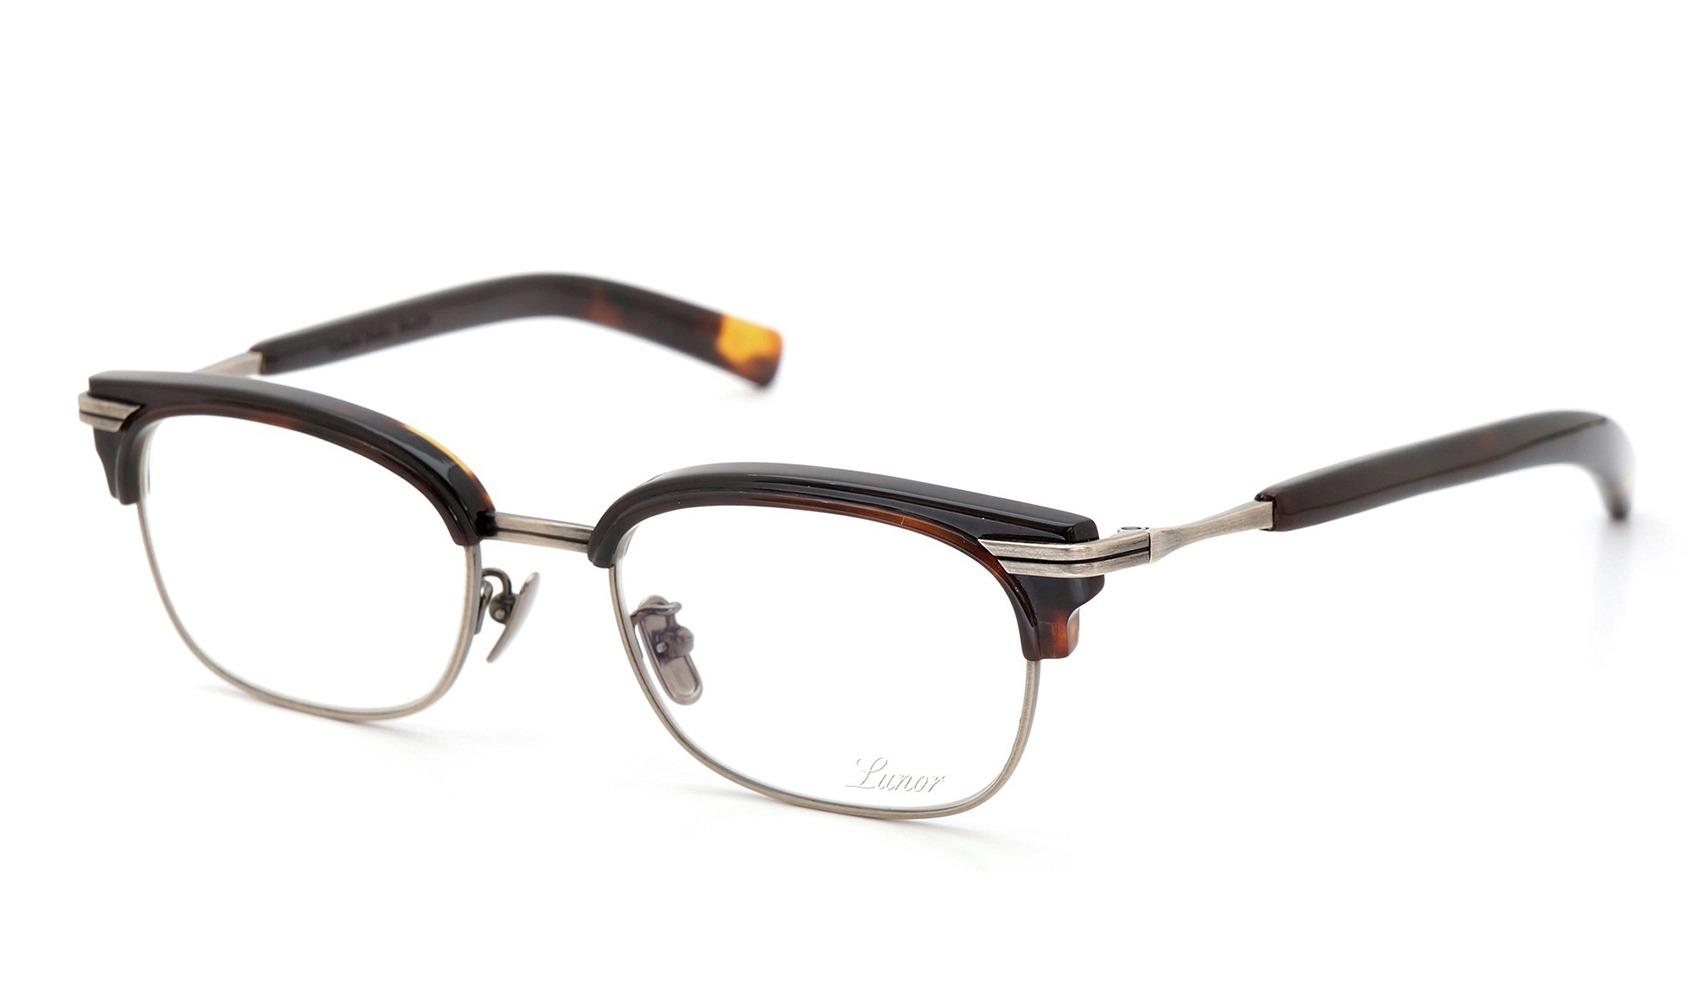 Lunor × 大澤鼈甲 Combi Bekko Mod.96 並甲